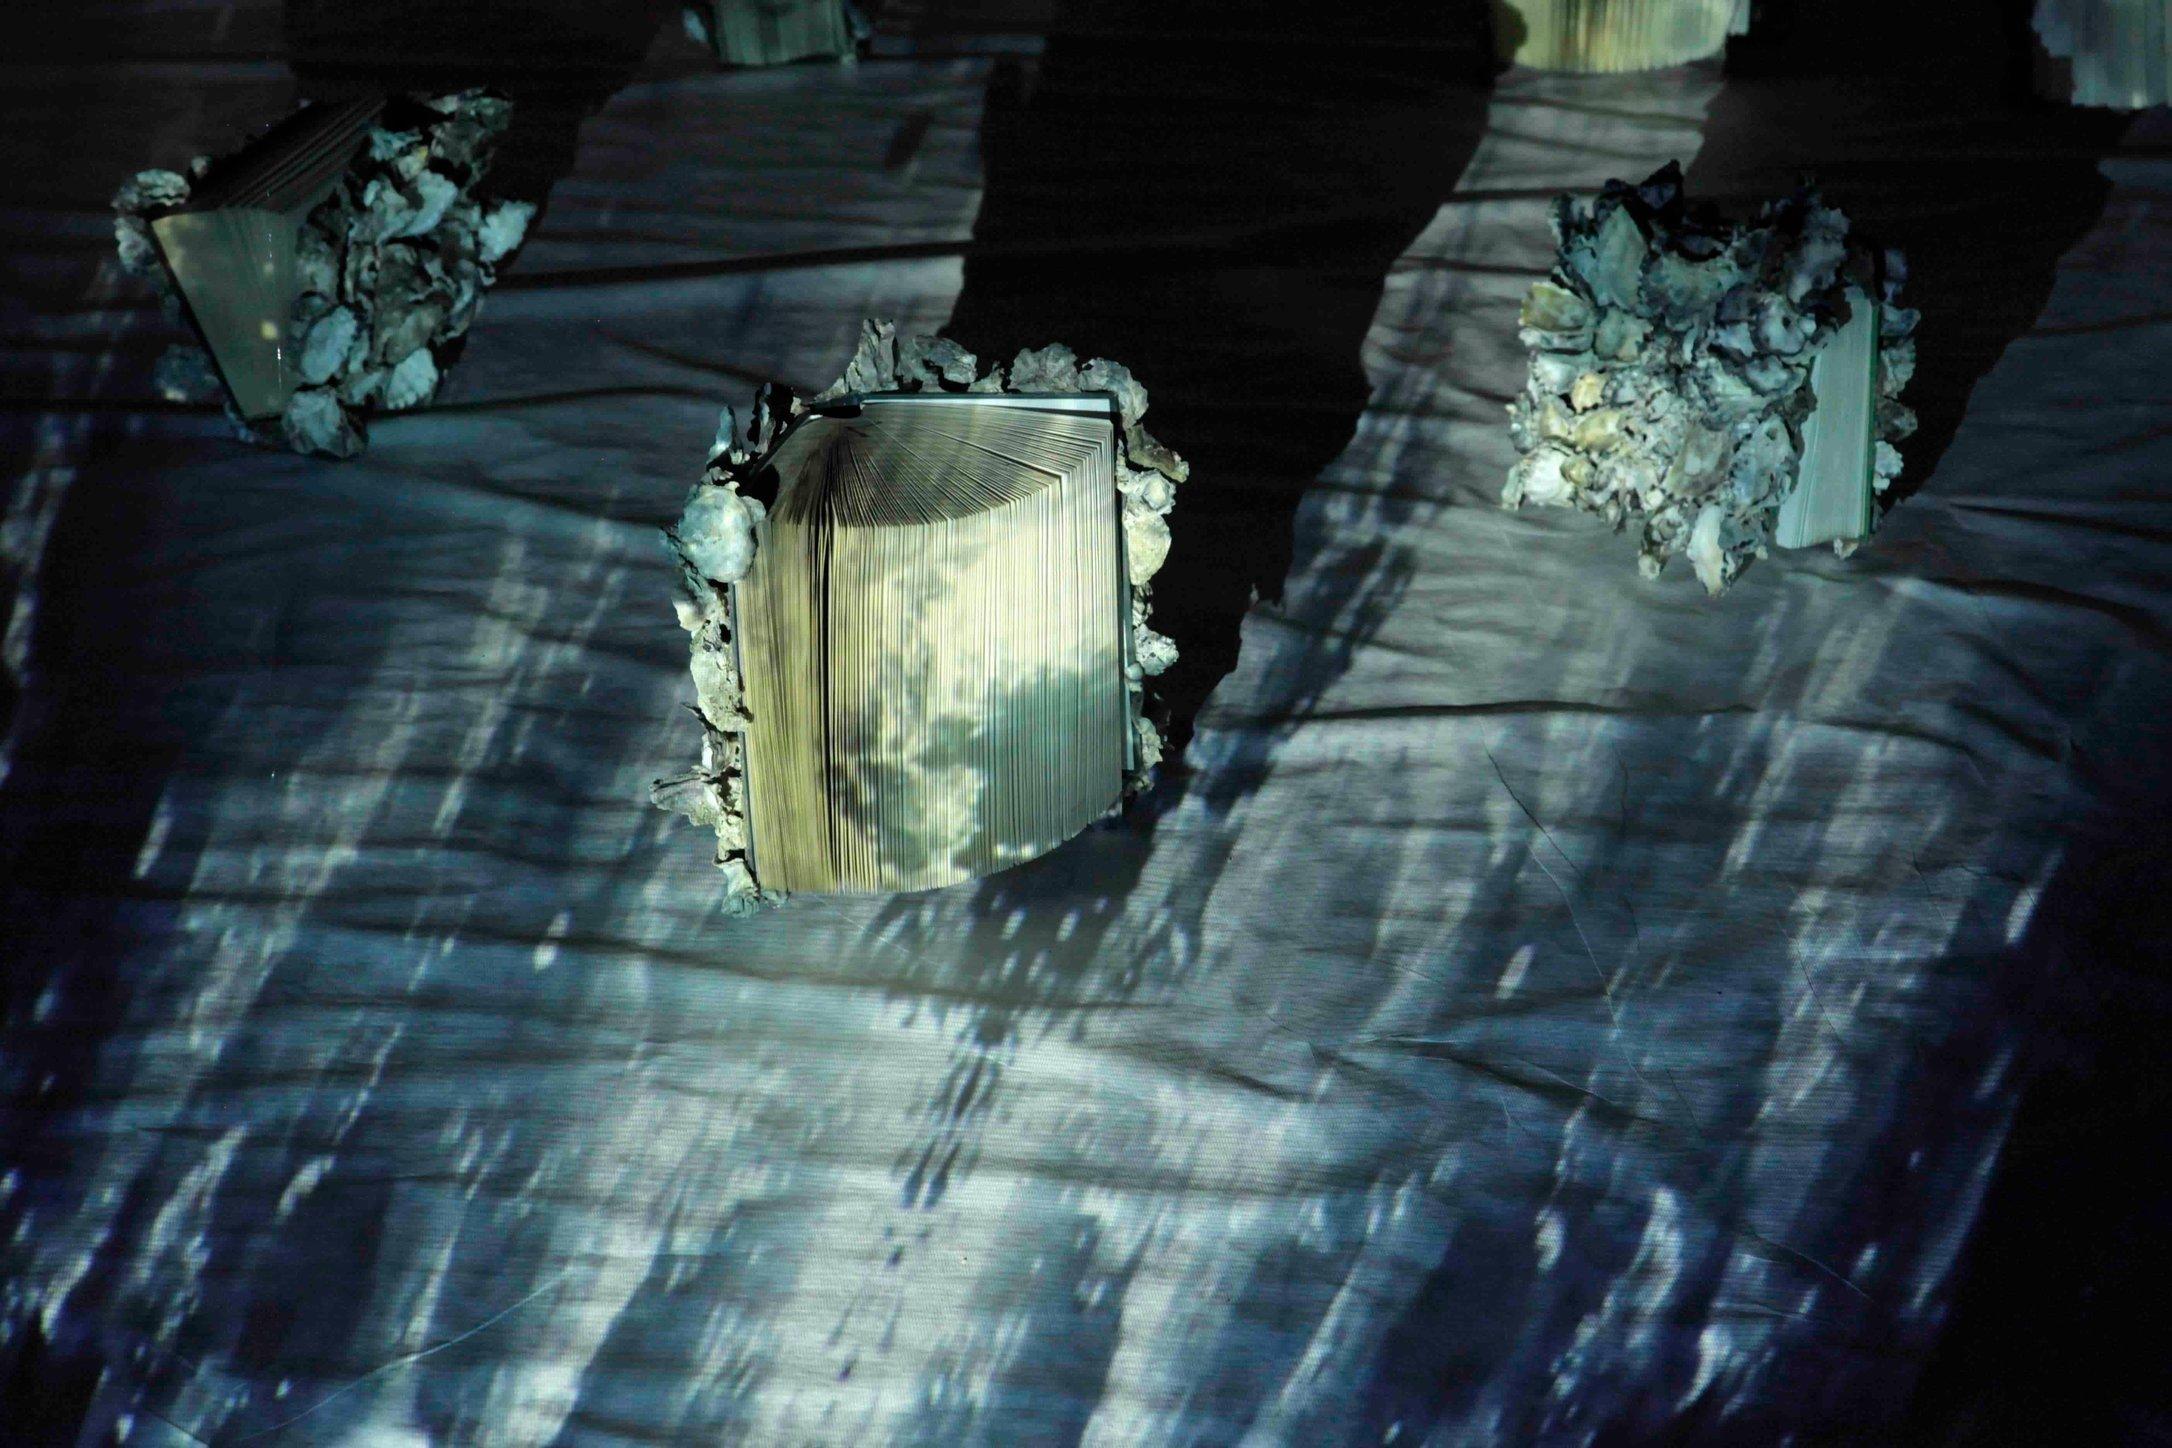 Jenny Pollak - The Immortals - installation detail (video still with sculptural element) 2.jpg